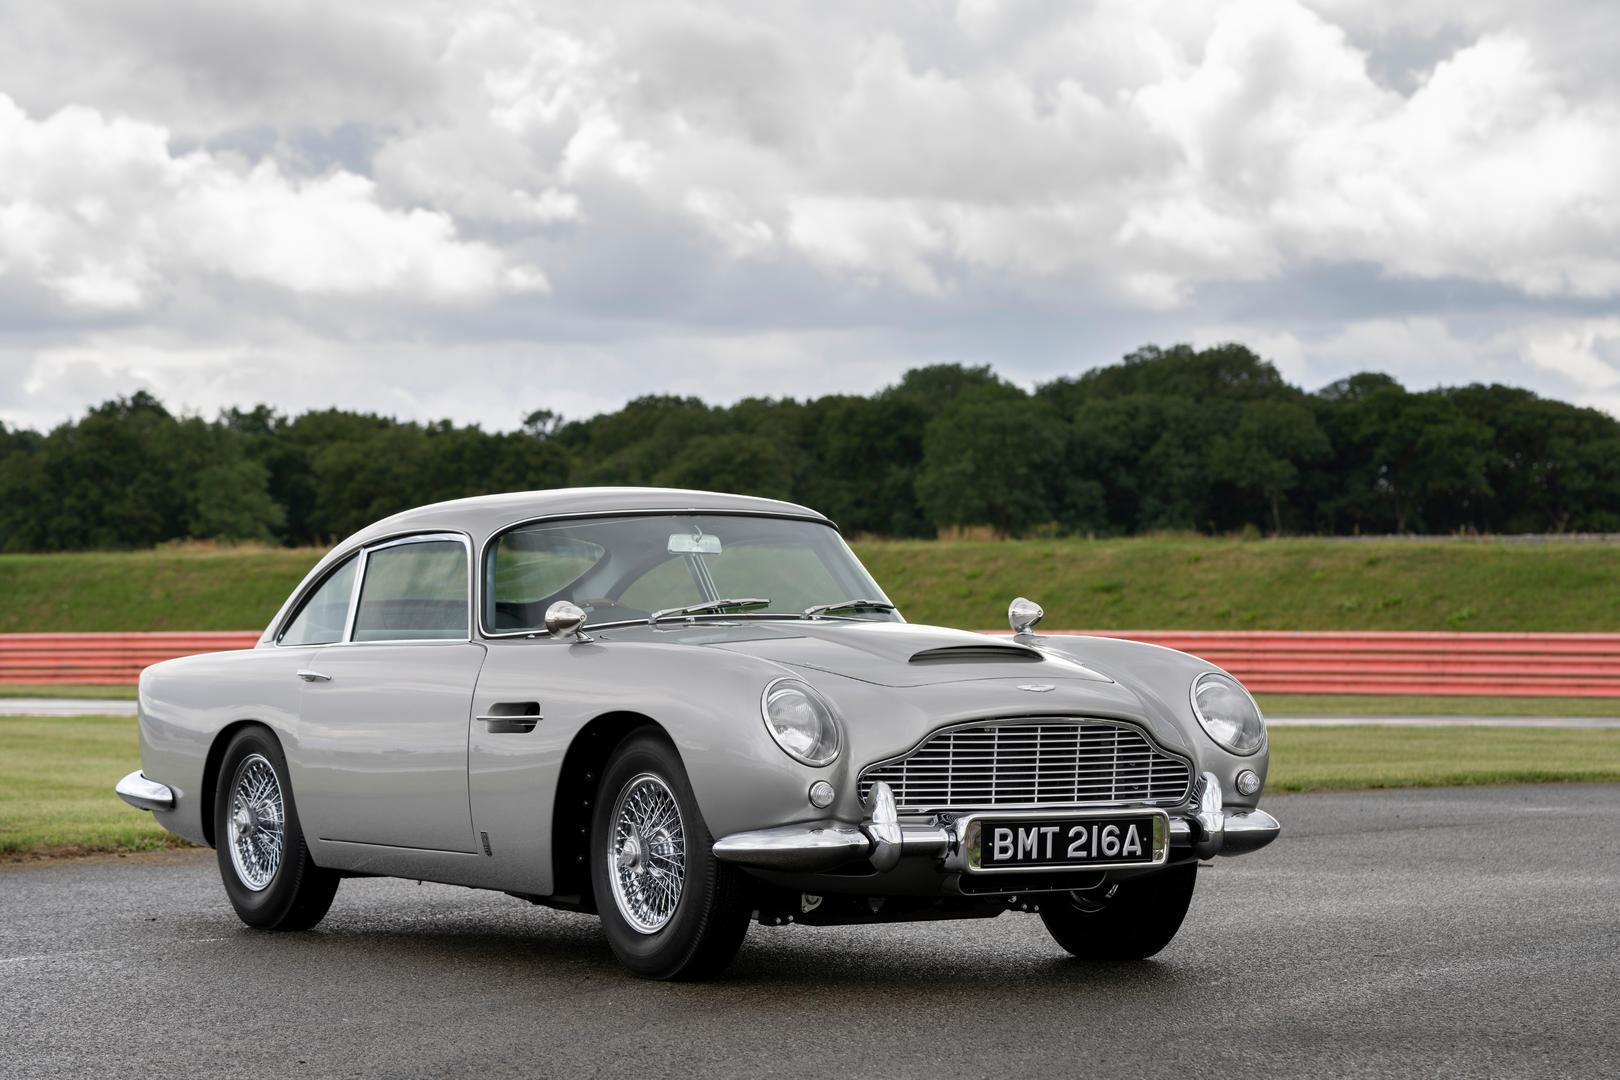 2020 Aston Martin DB5